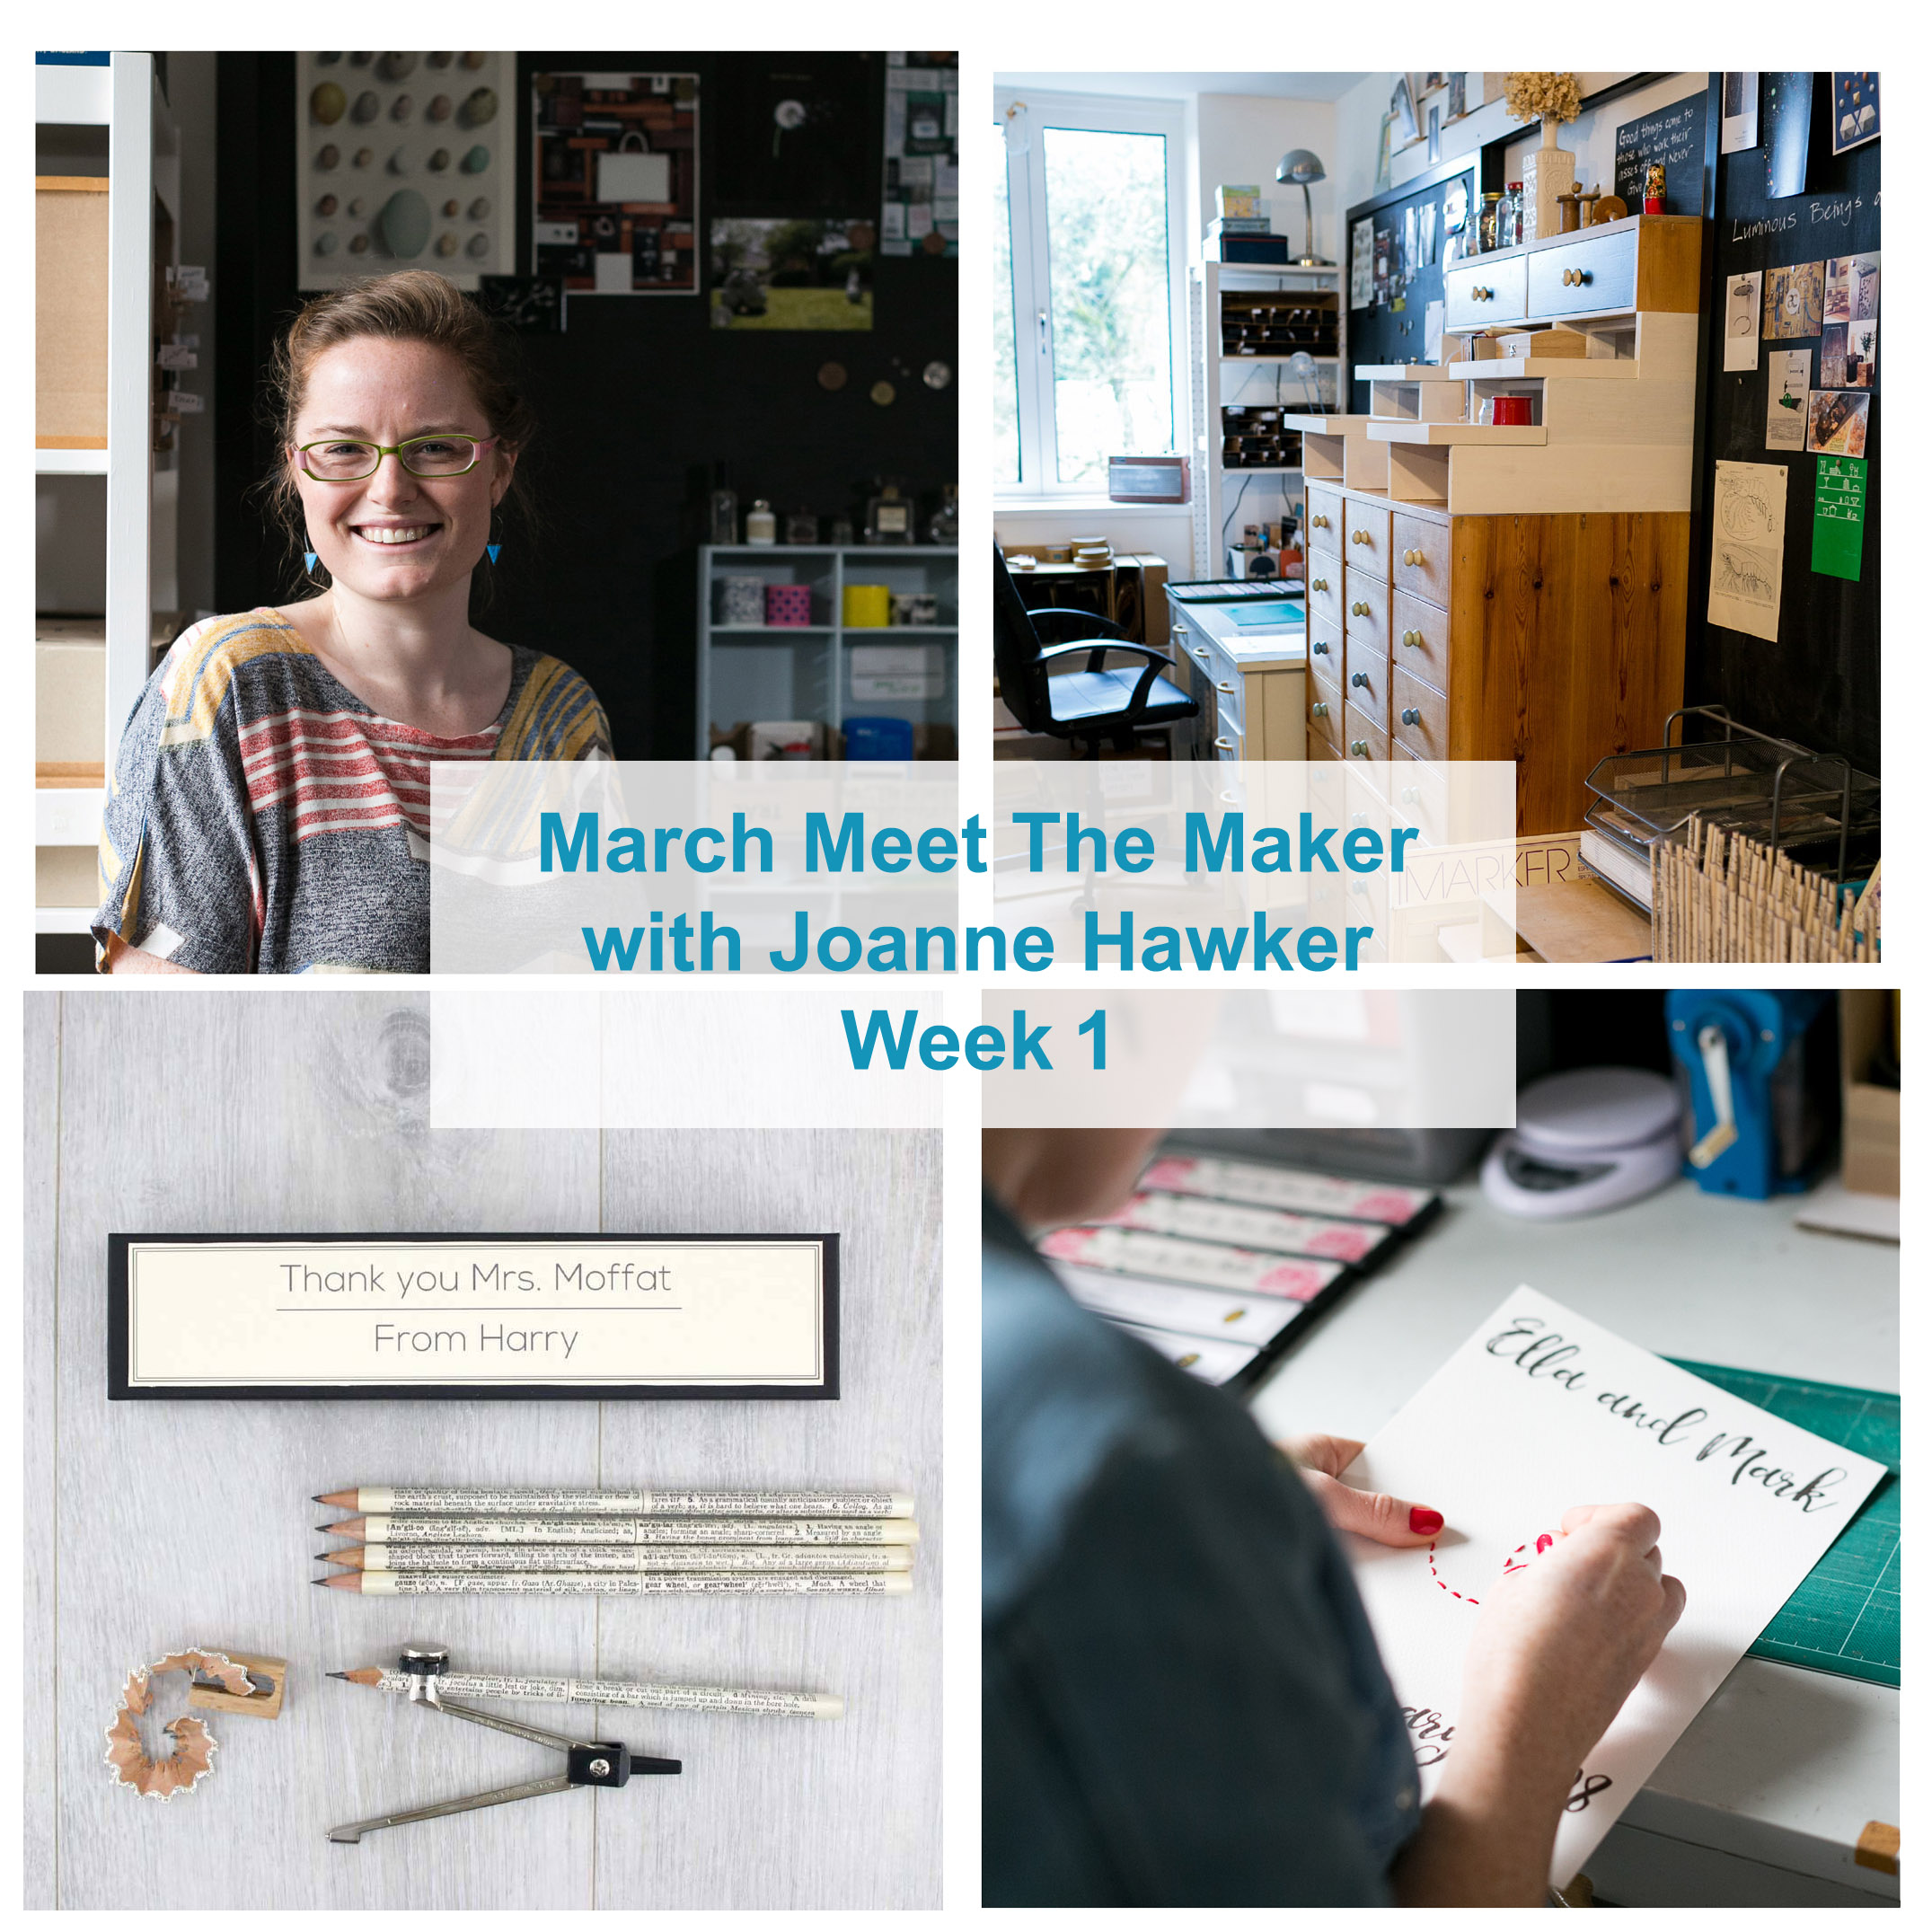 march meet the maker with joanne hawker week 1